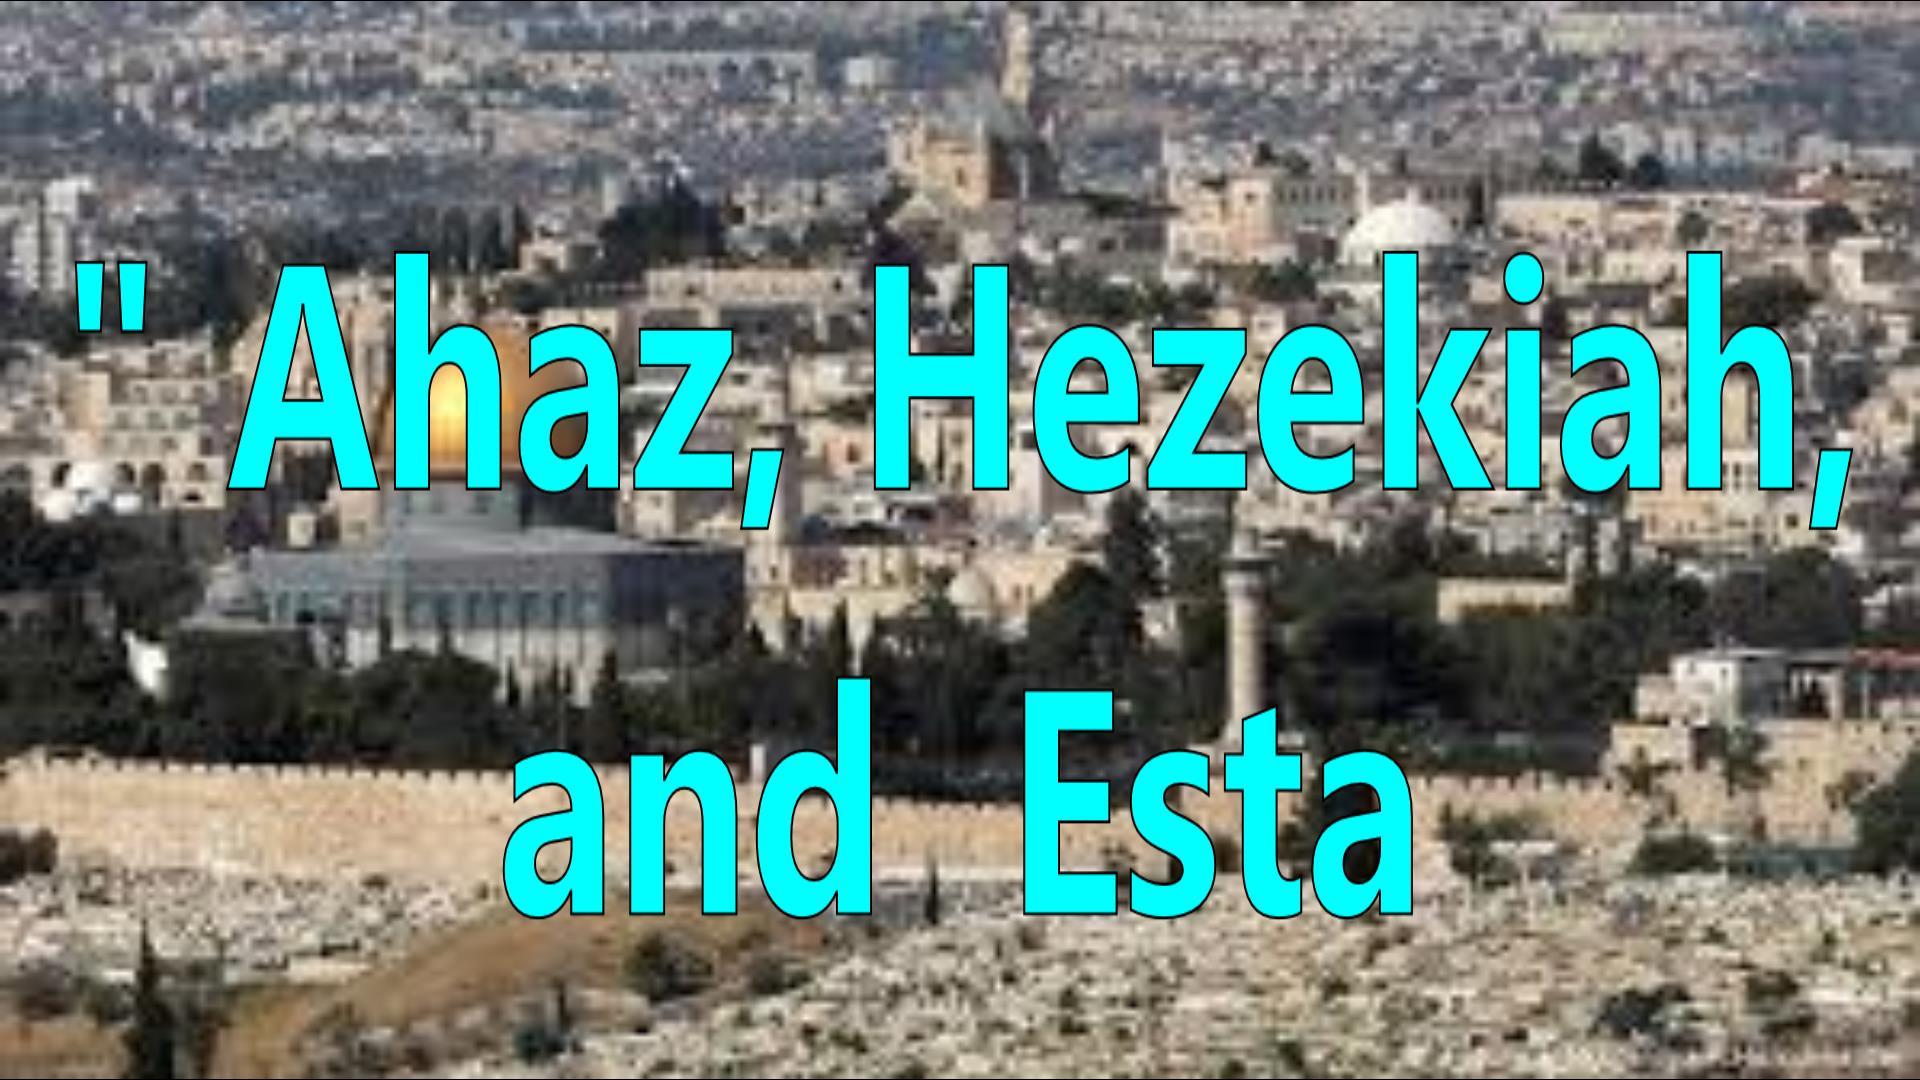 Ahez, Hezekiah, and Esta